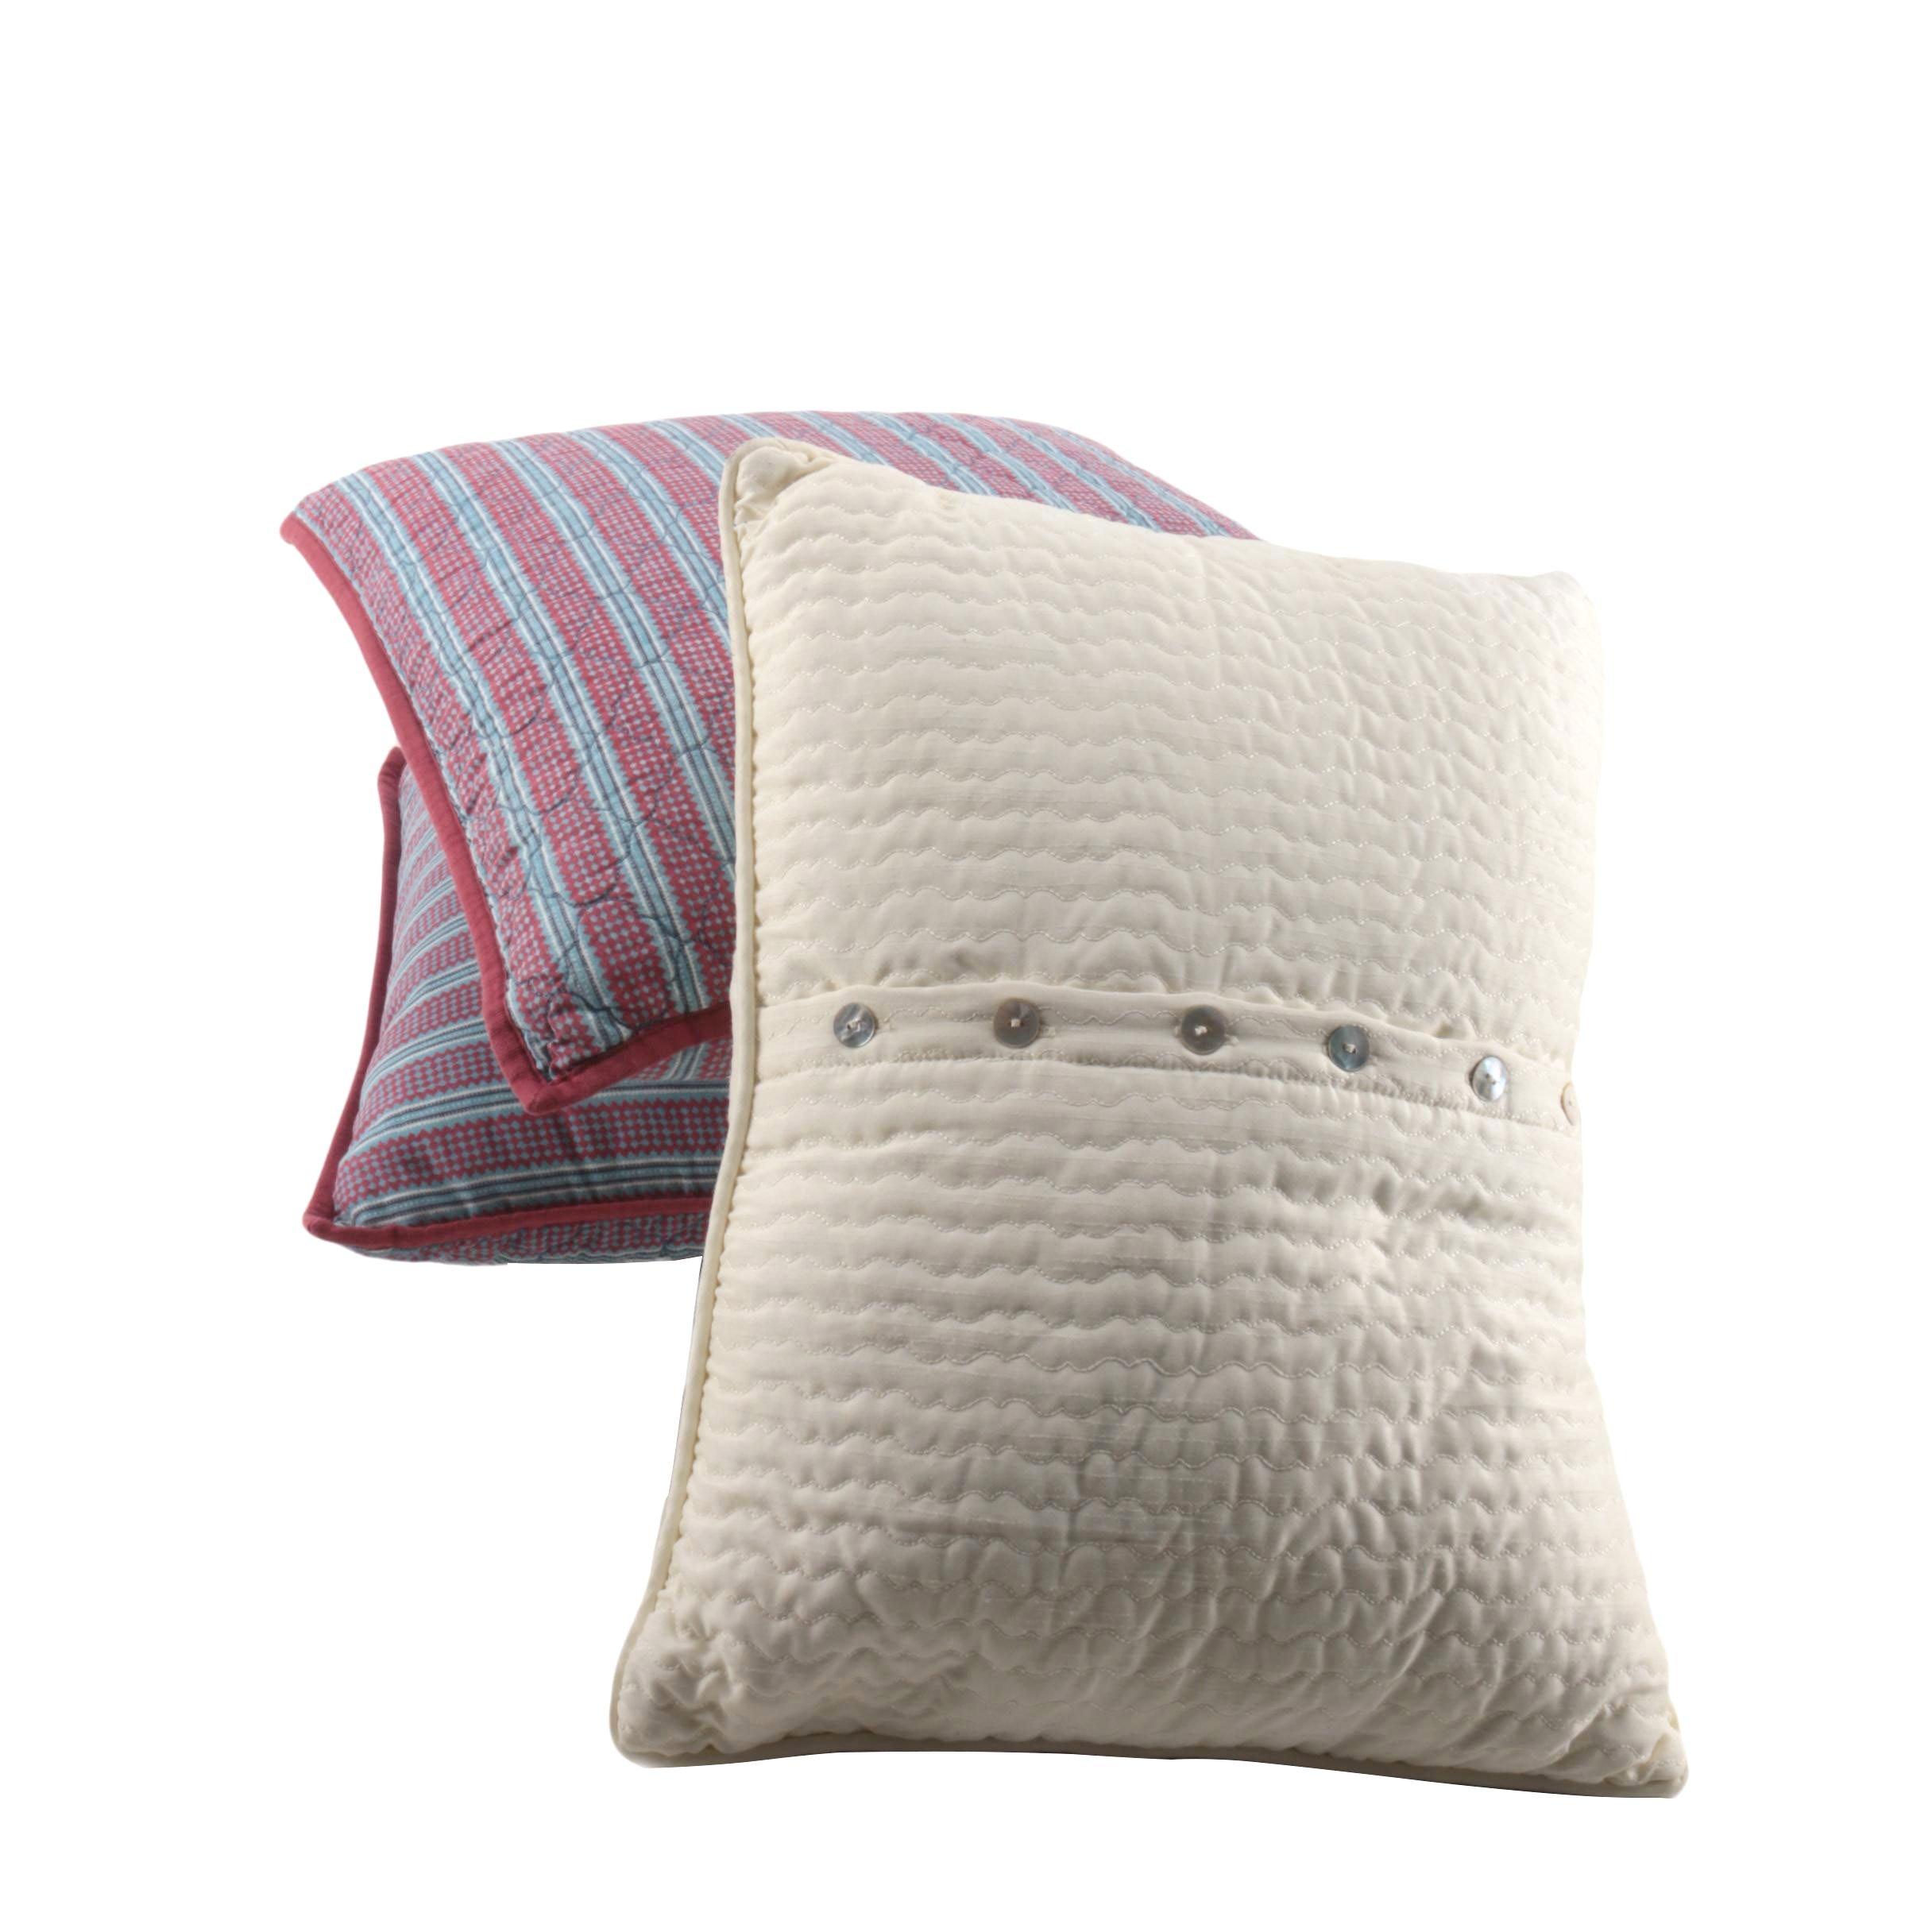 Throw Pillows With Button Closures